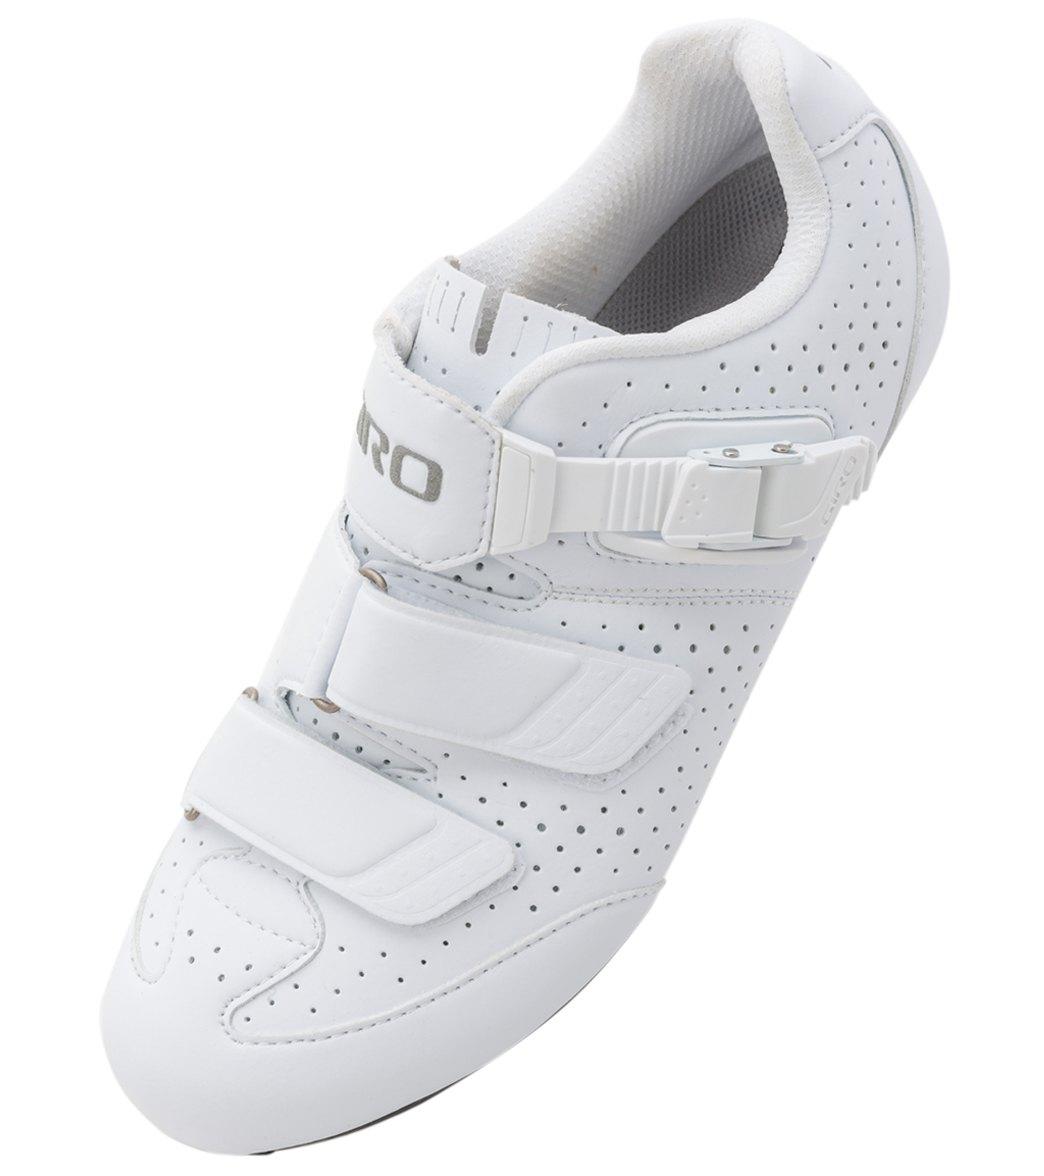 GIRO  Shoes Espada woman( white)